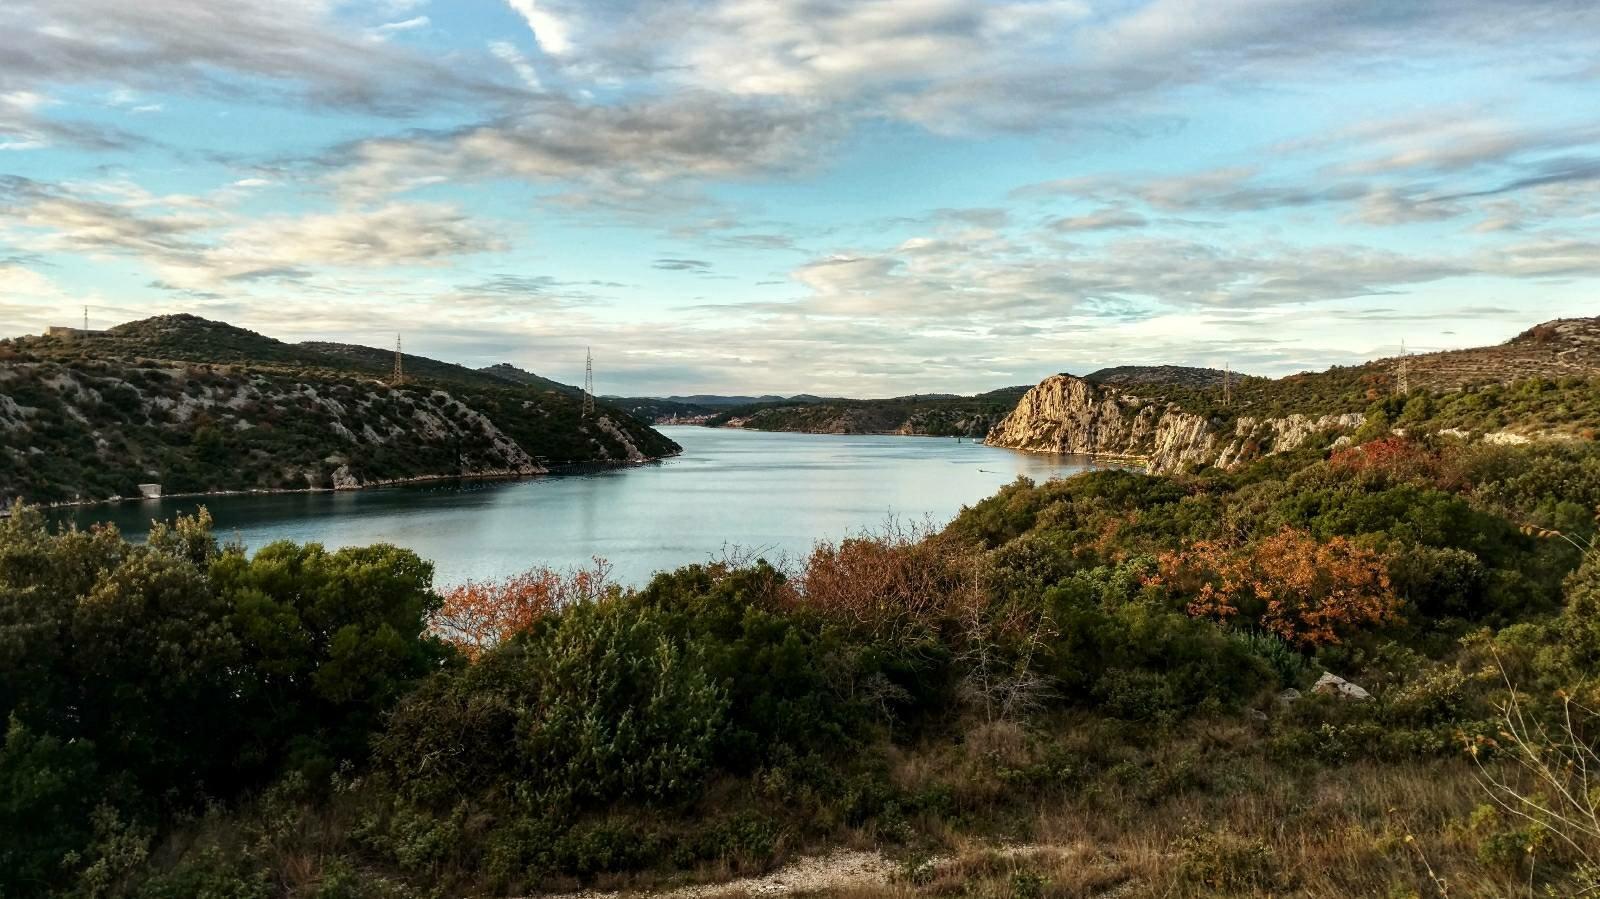 BLOG | Krka National Park with Krka river, Croatia